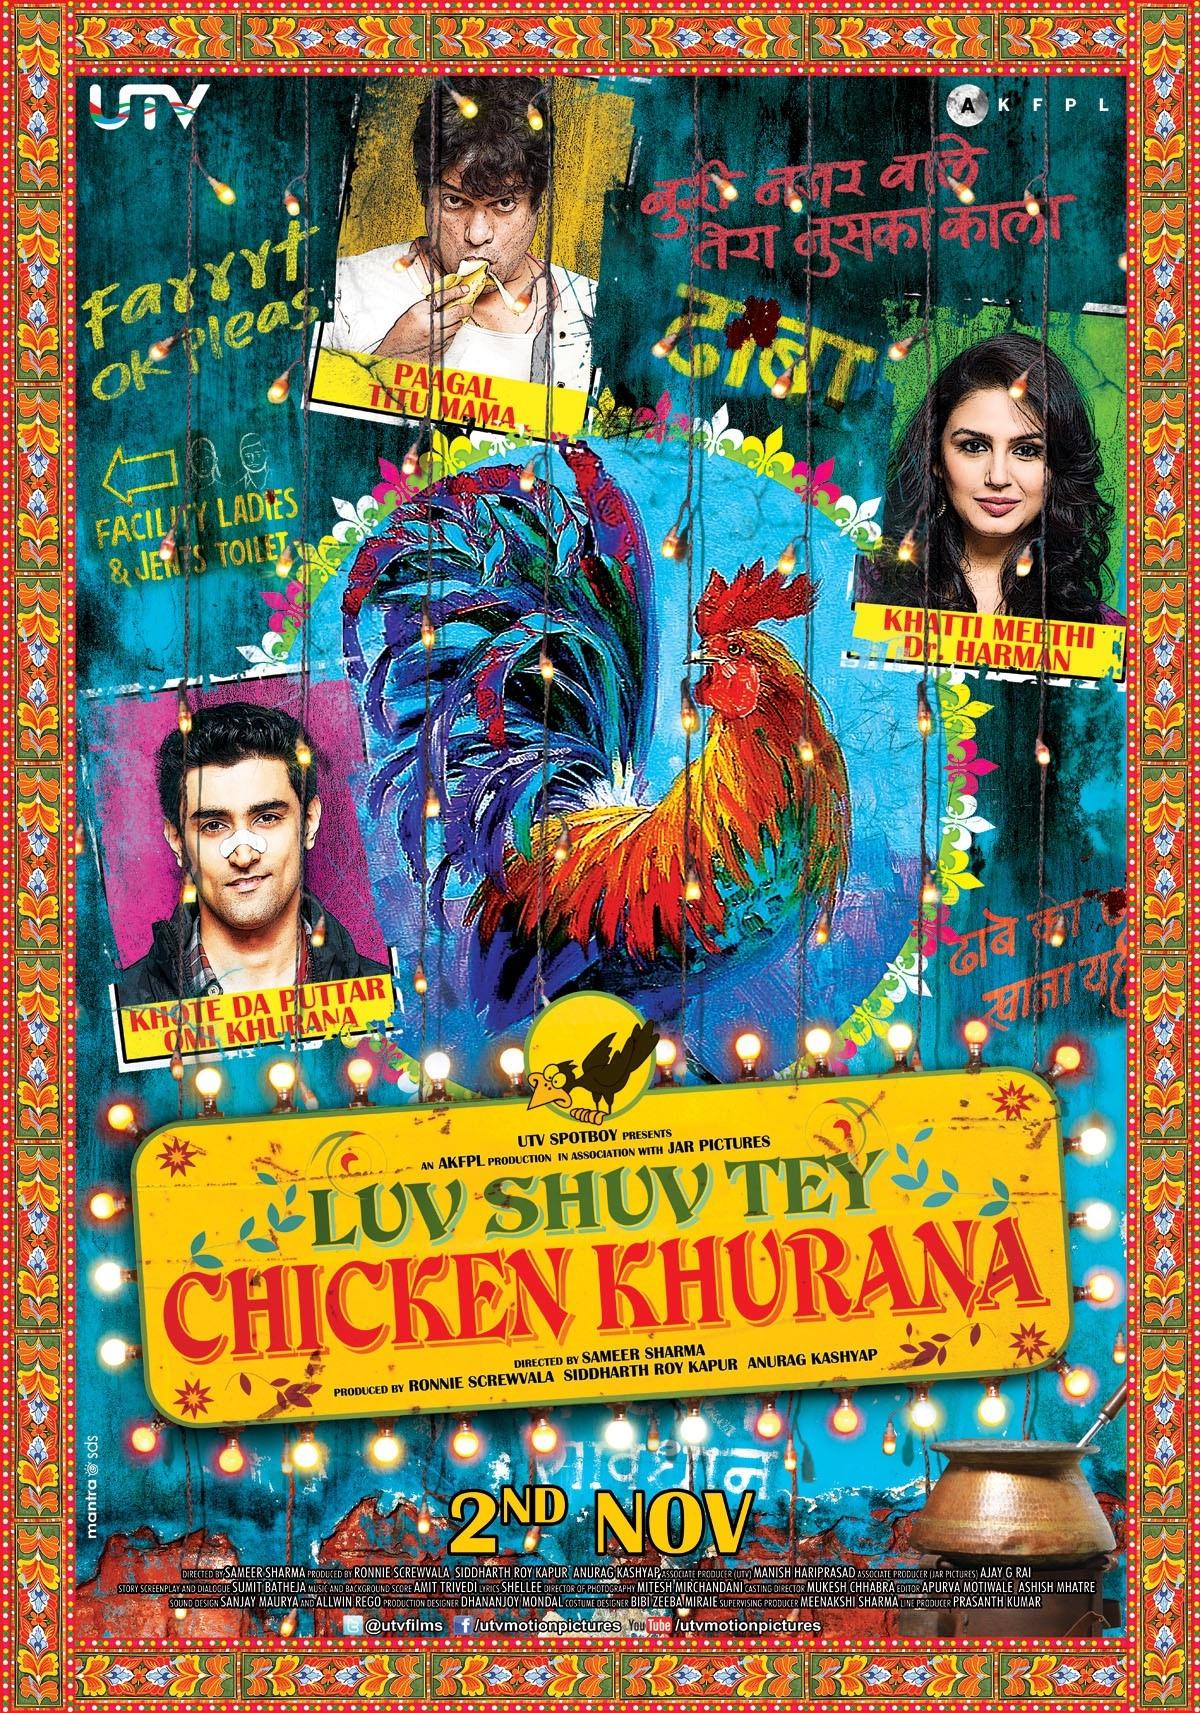 Luv Shuv Tey Chicken Khurana - Movie Poster #1 (Original)